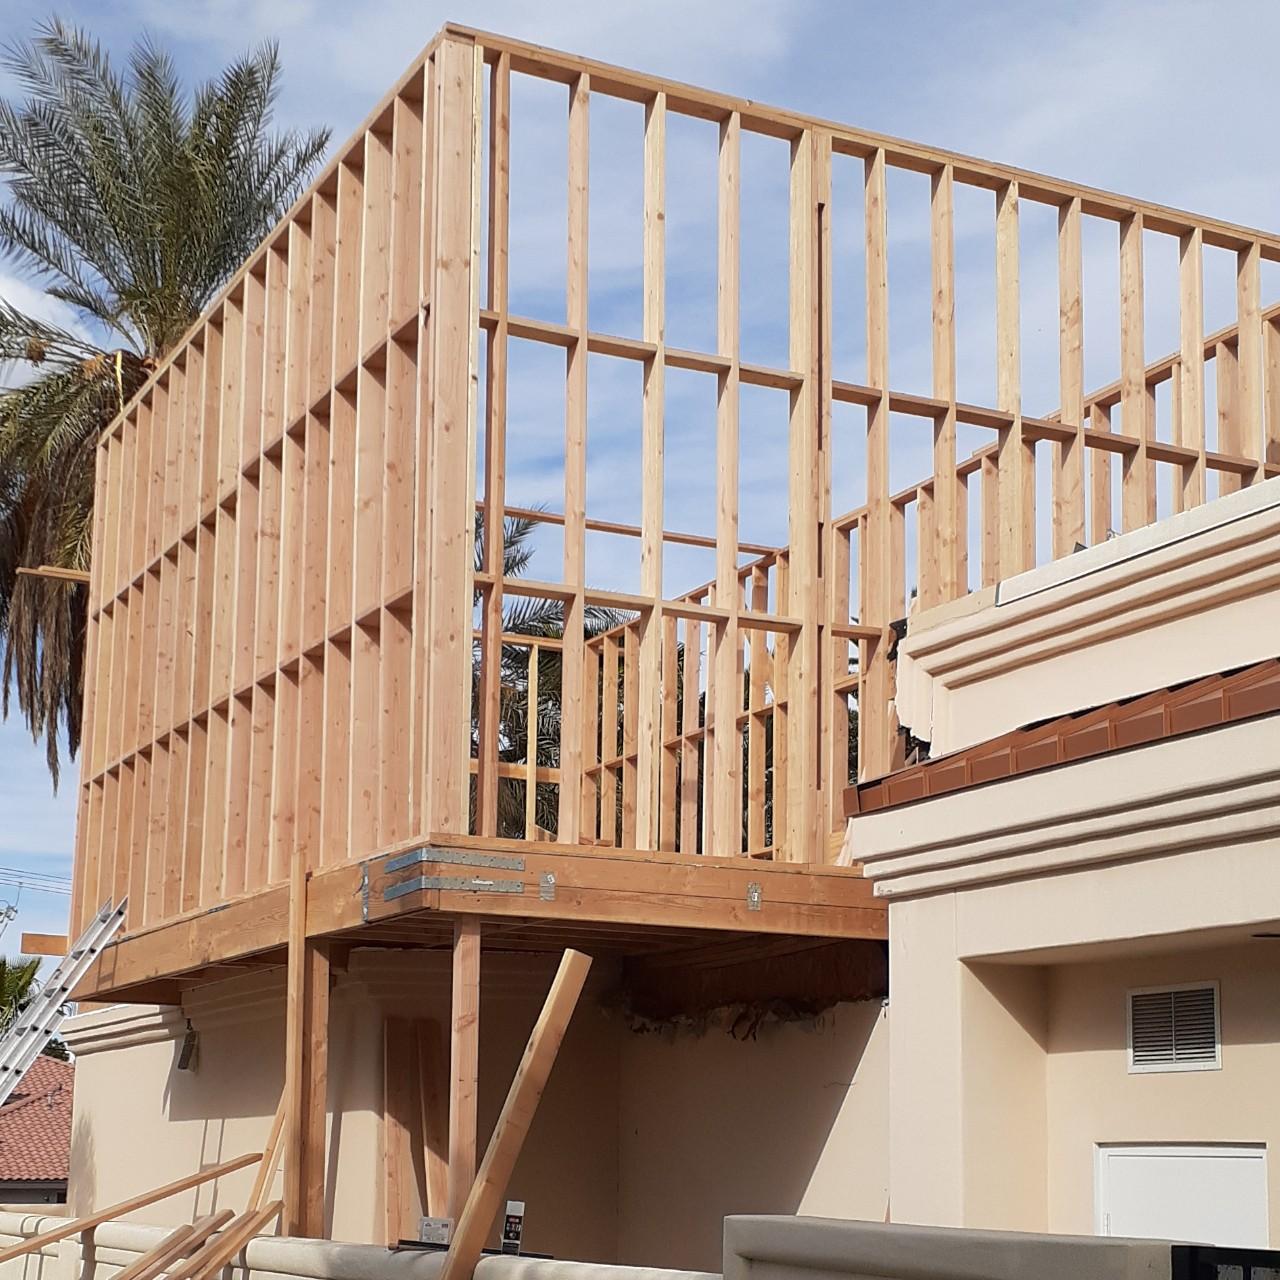 carpentry-wood-framing-second-floor-home-addition--framing-98